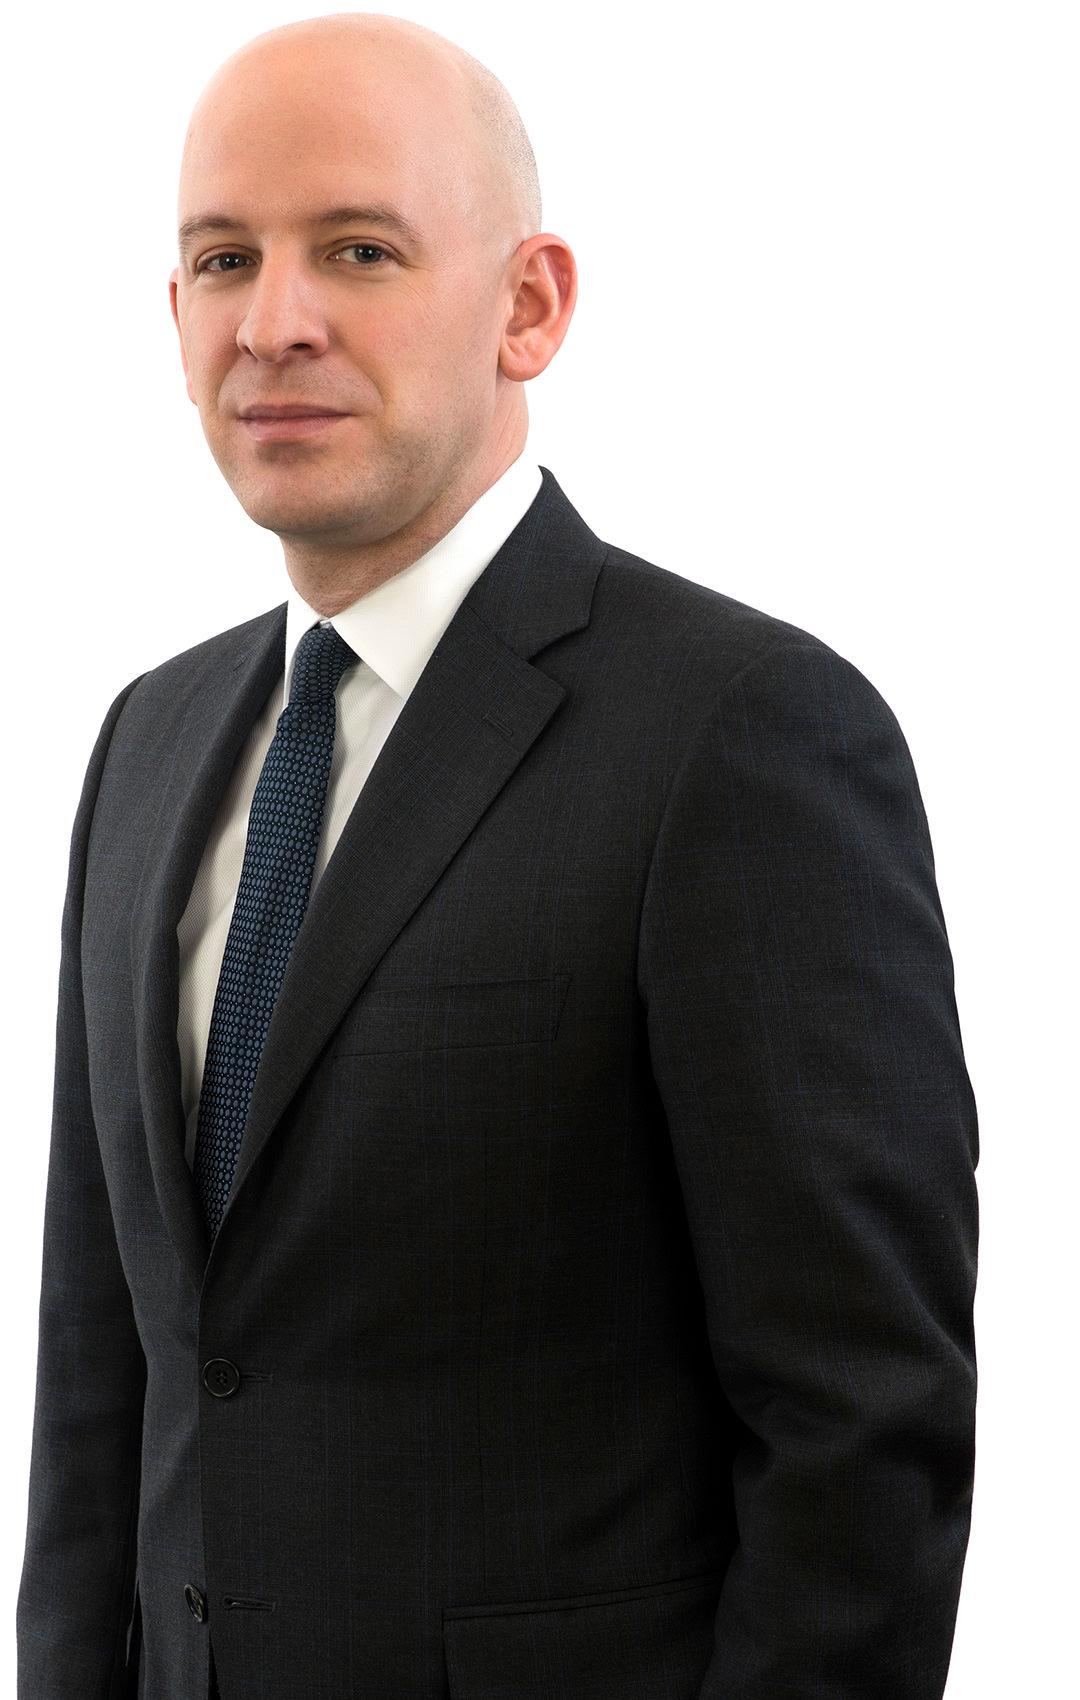 Matthew G. Lindenbaum